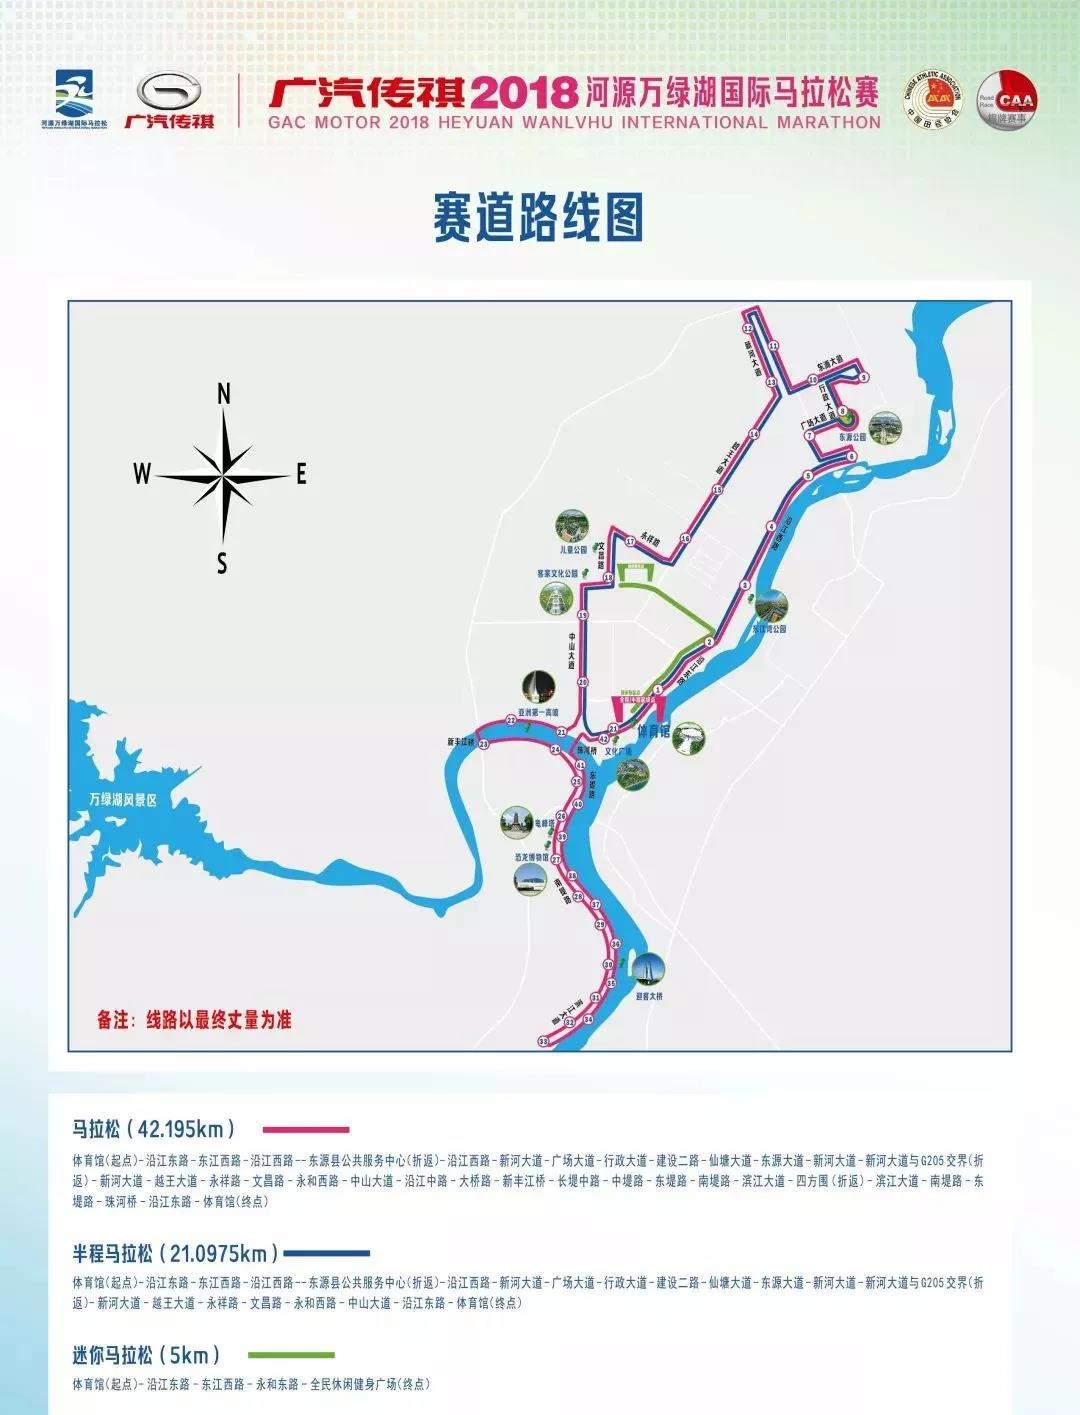 http://img.sport-china.cn/181129105bff50eae2963.jpeg